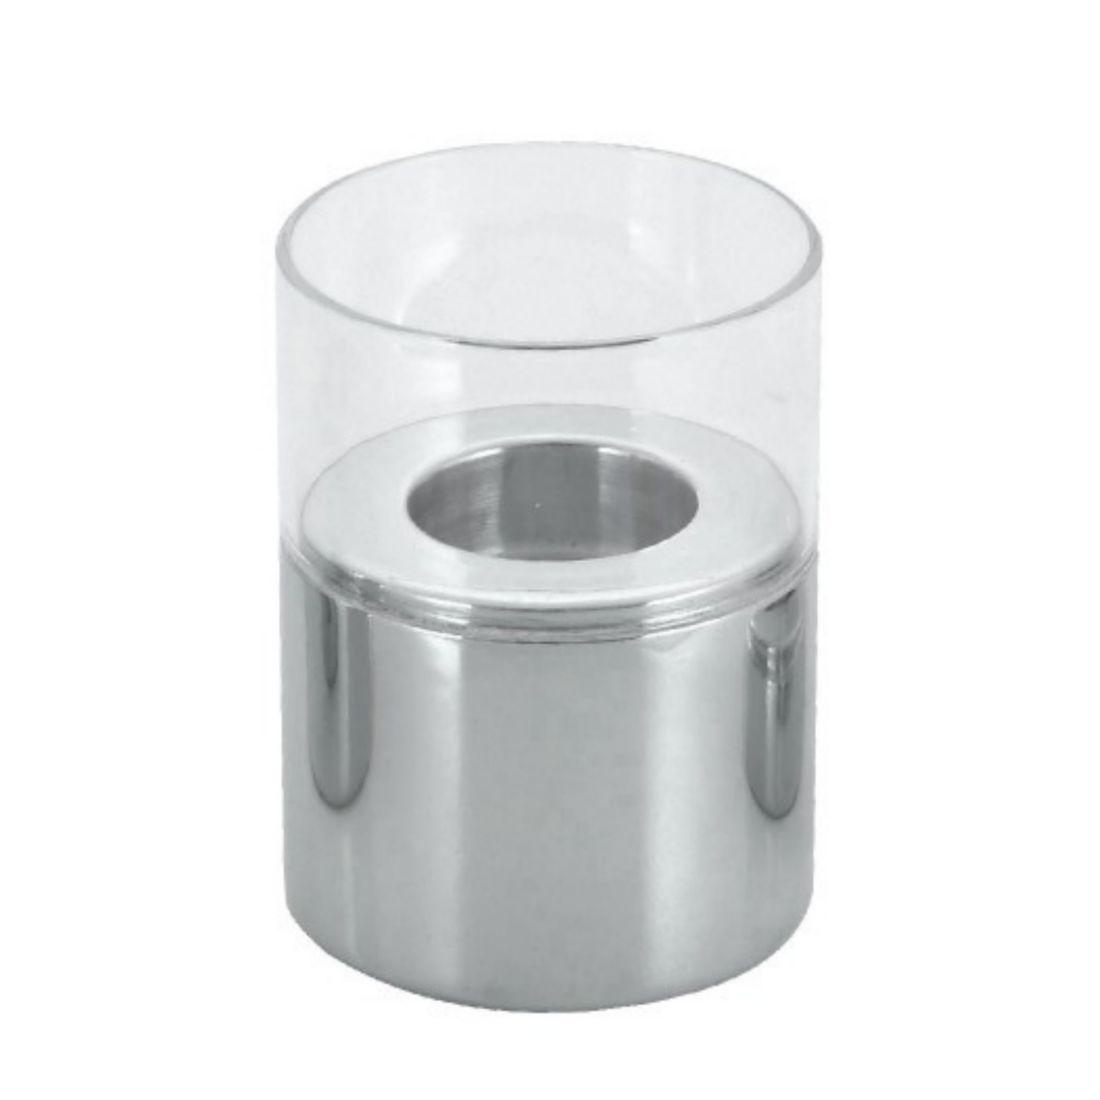 Svícen nerez + sklo 8x13,5 cm